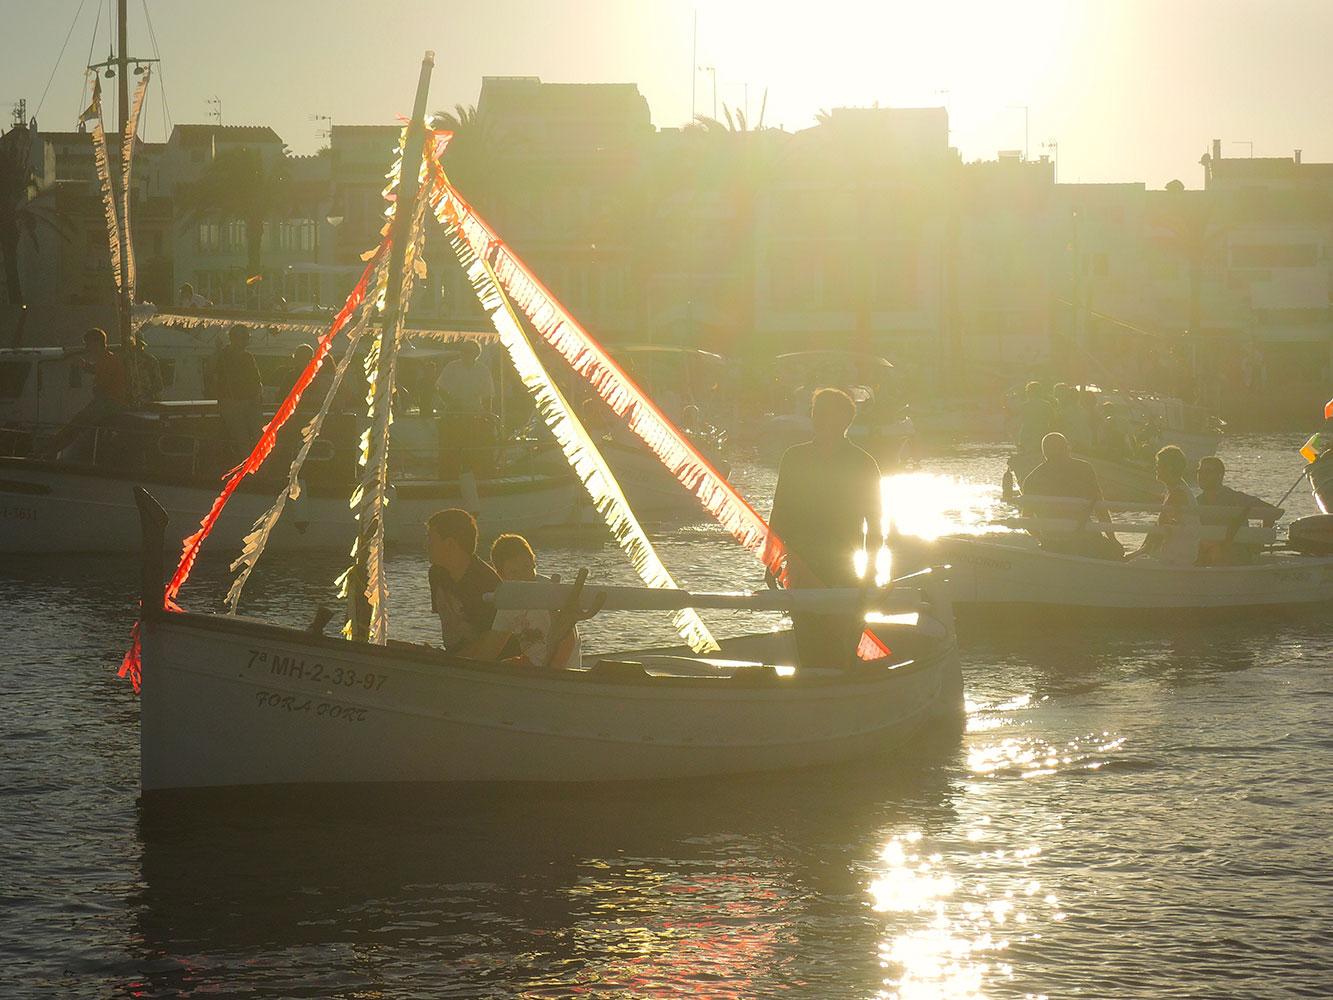 fornells-menorca-fiesta-del-santa-clara-boats-on-water